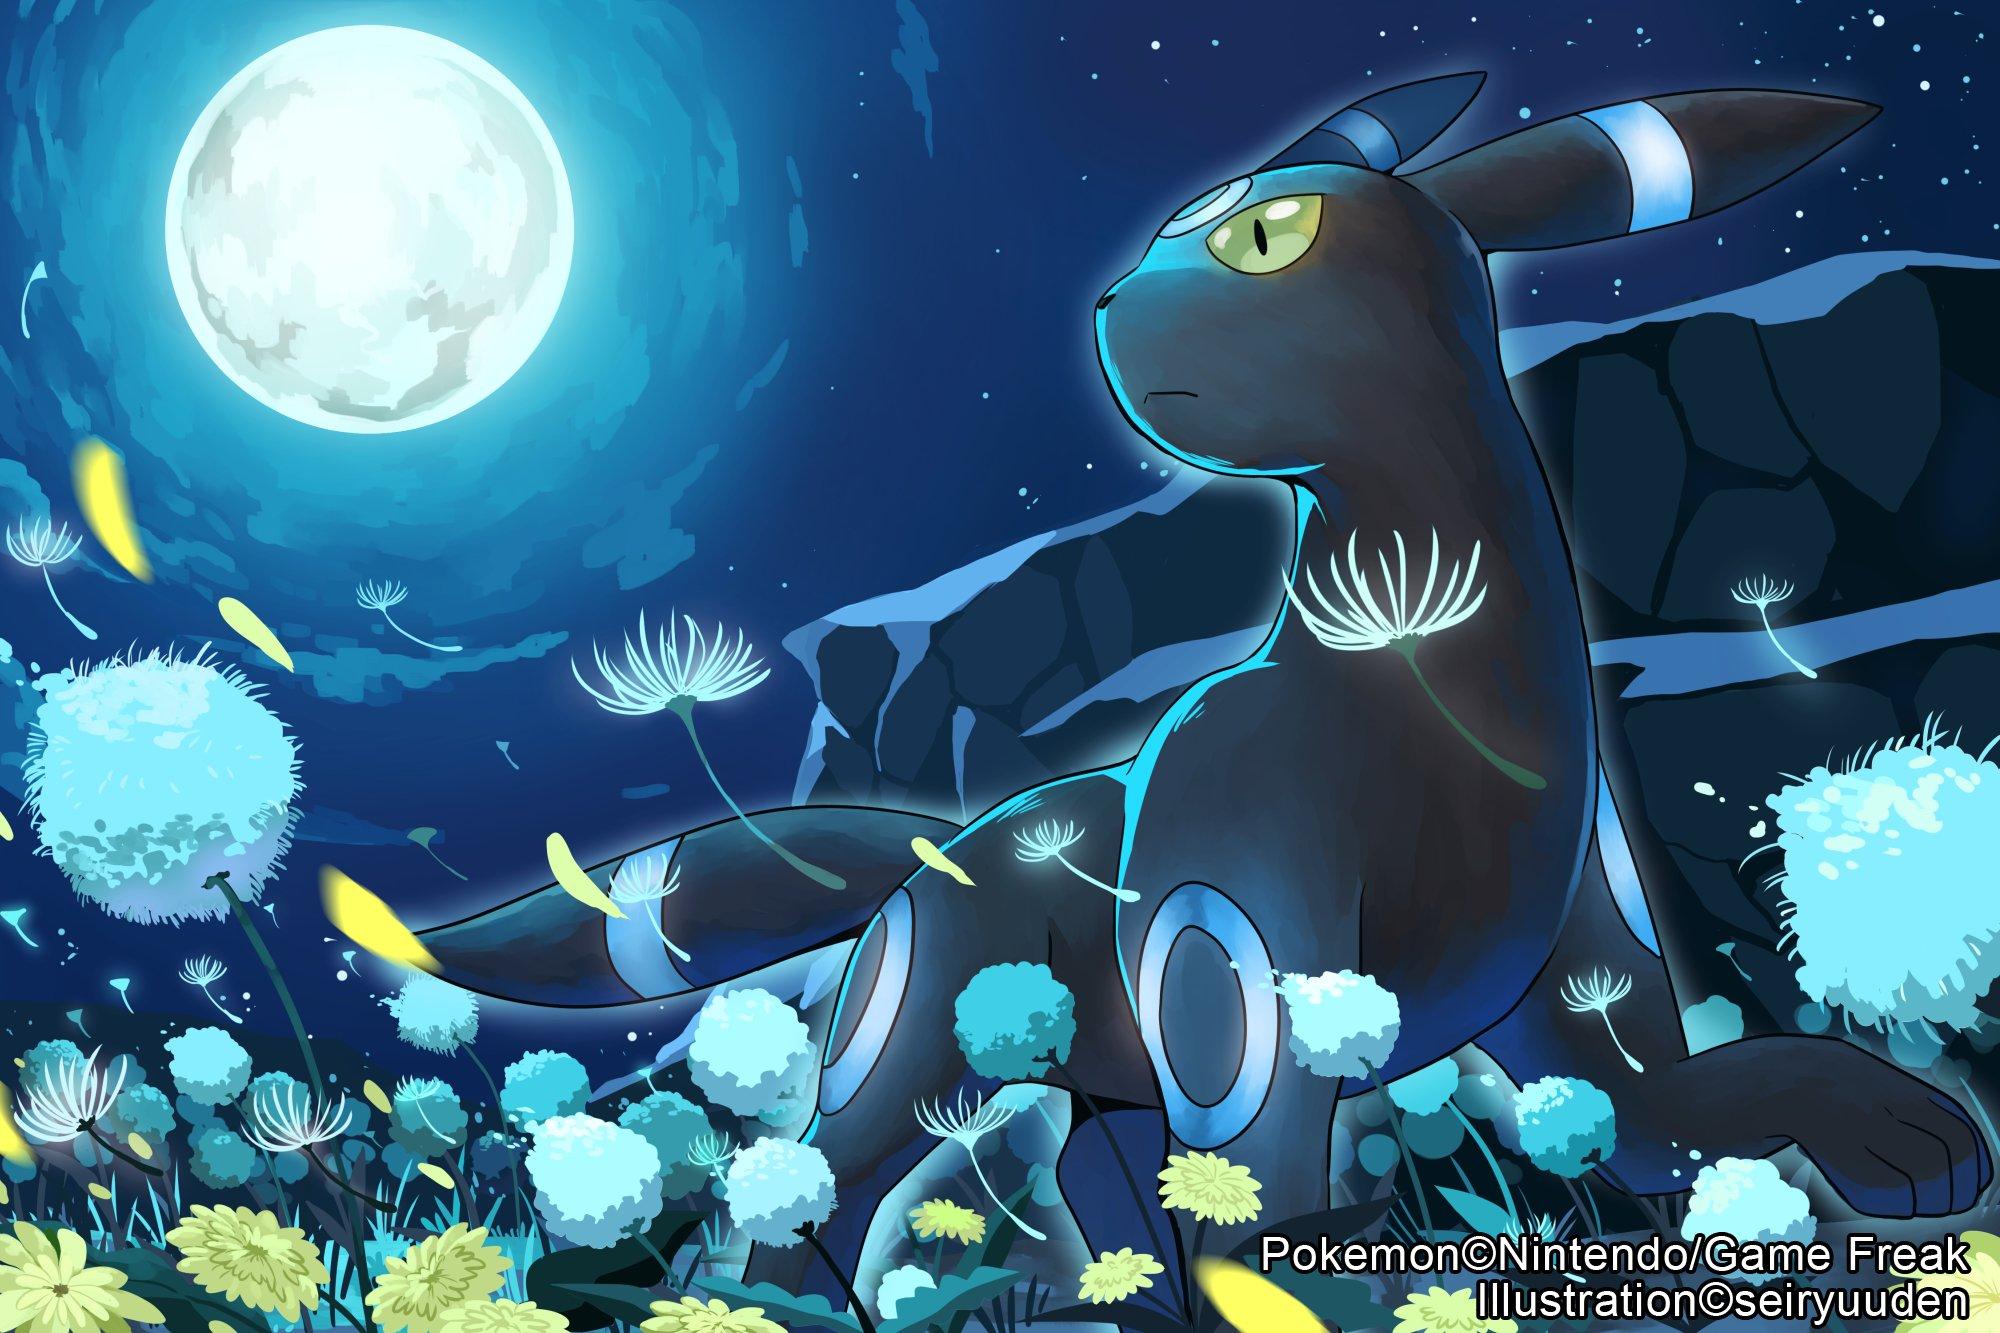 Pokemon Umbreon g wallpaper 2000x1333 340952 WallpaperUP 2000x1333